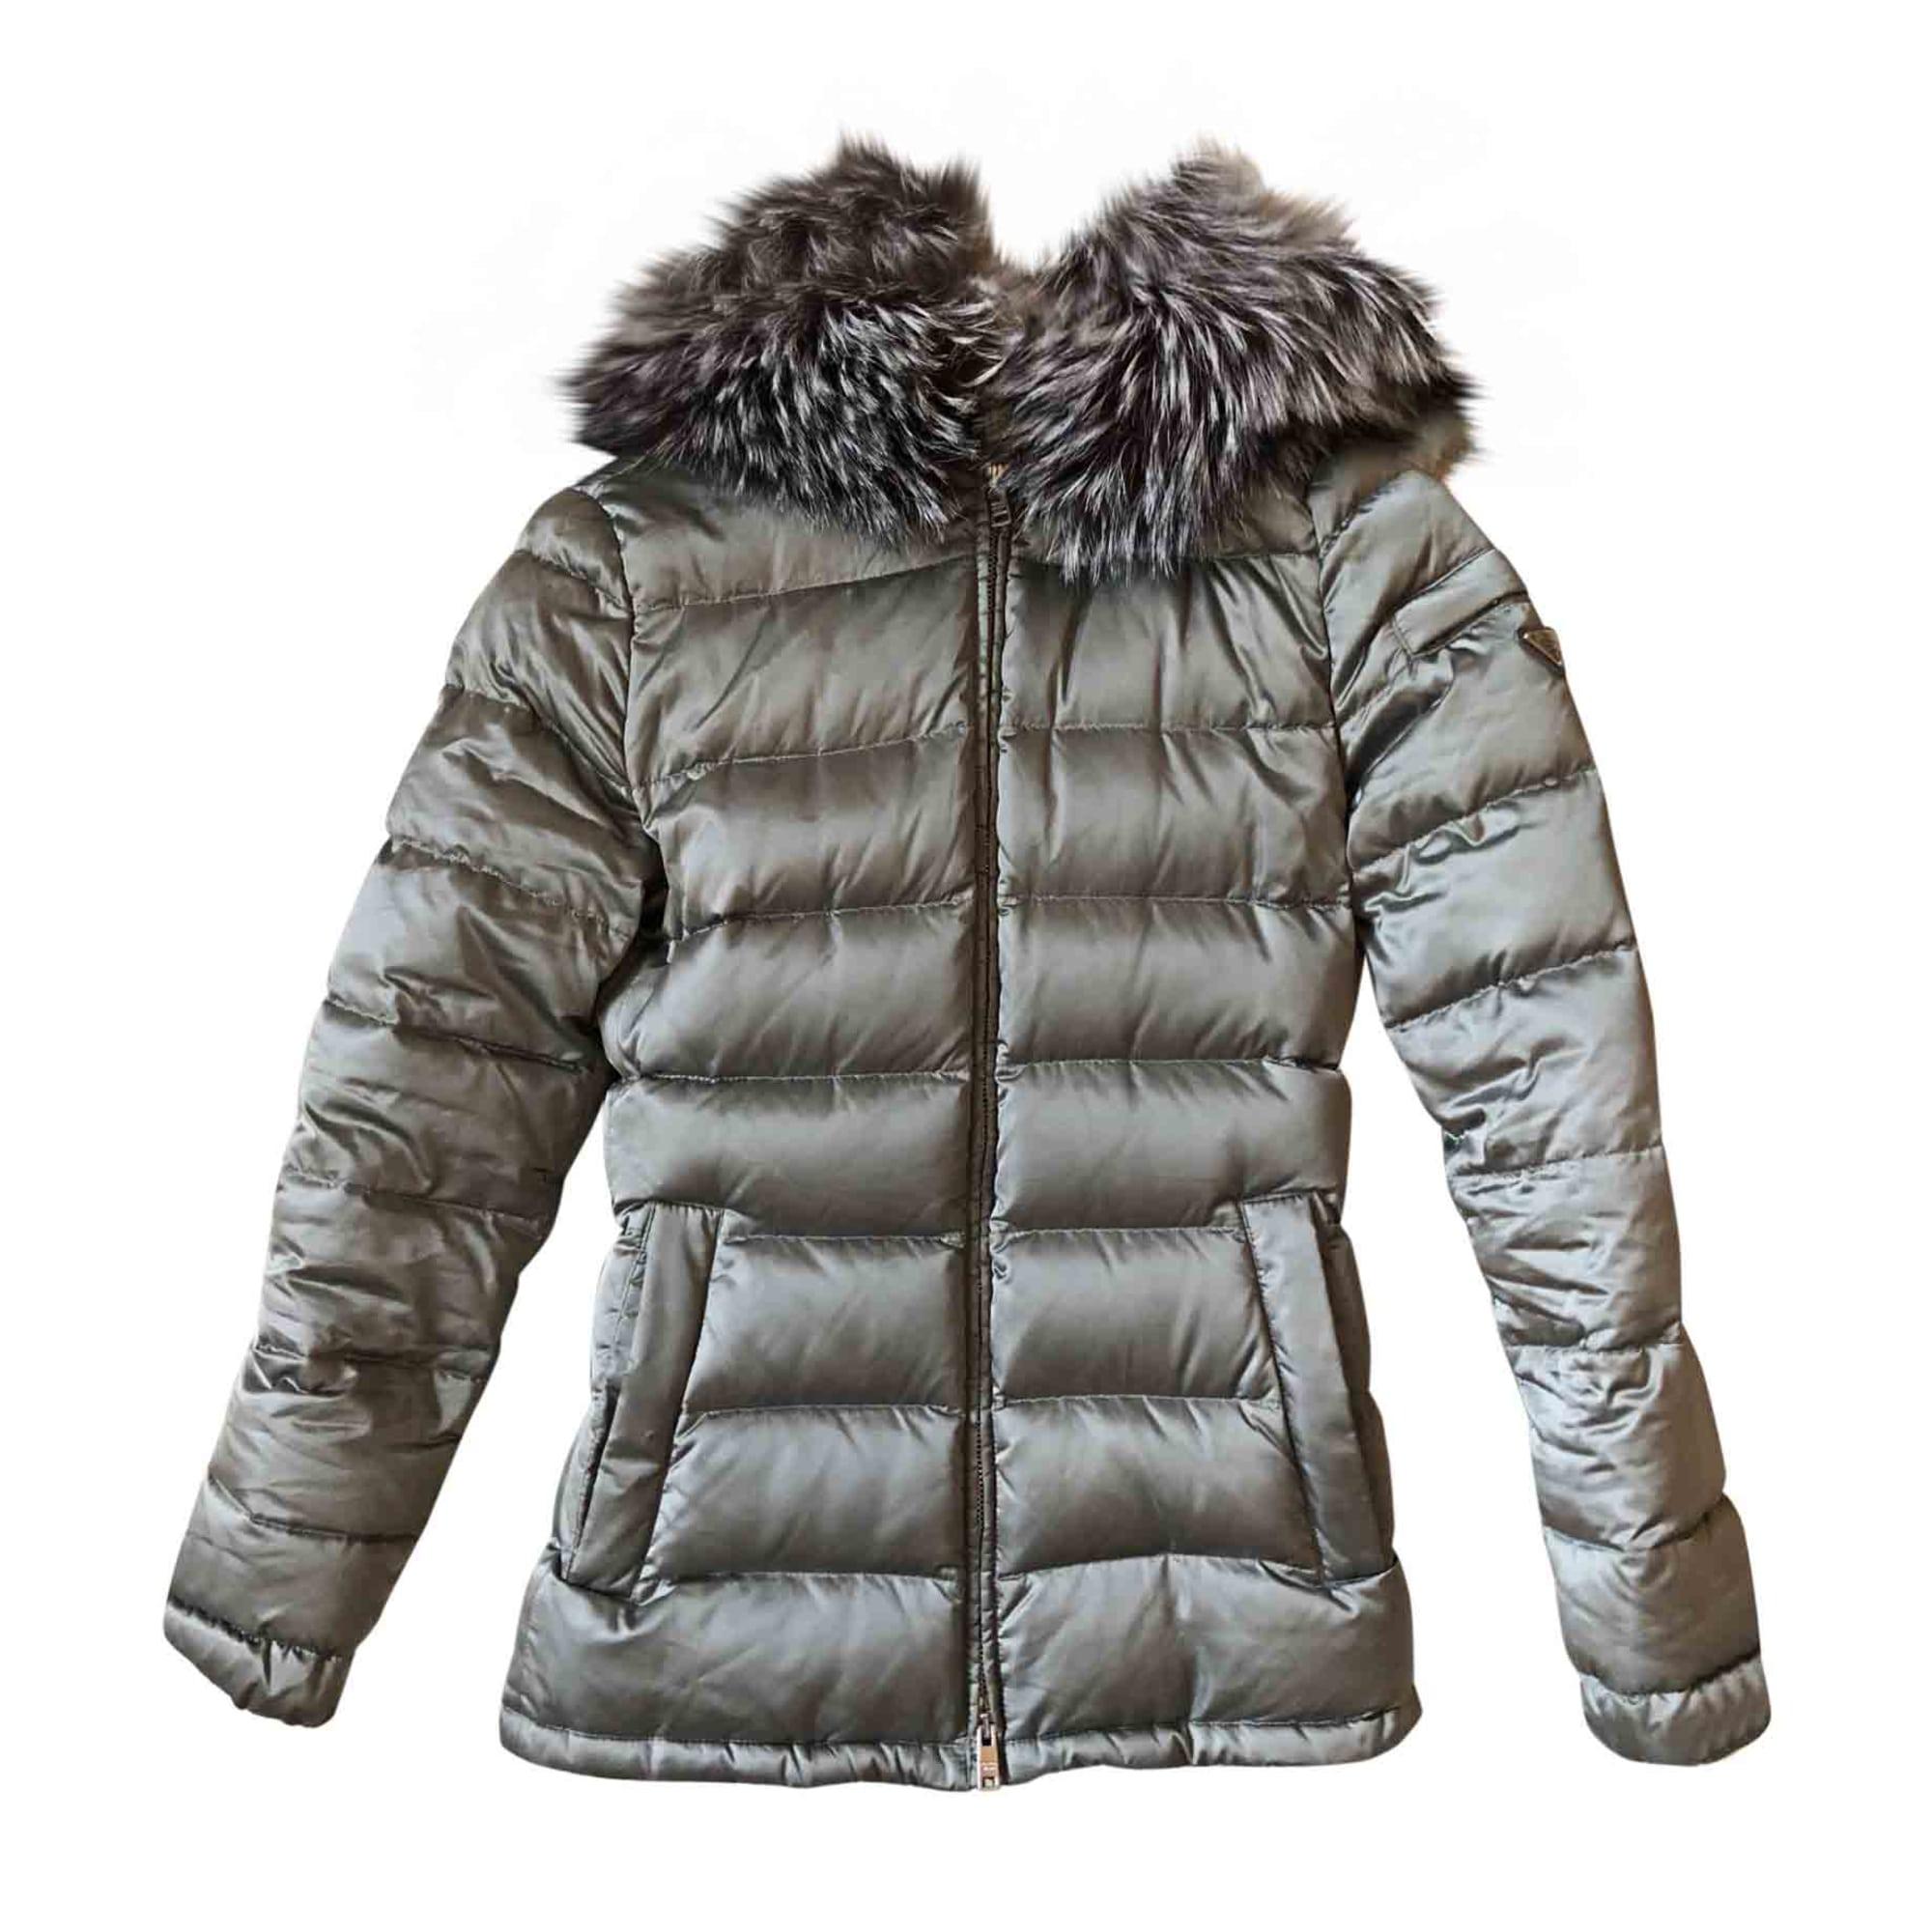 Doudoune PRADA 34 (XS, T0) gris vendu par Felicia 2202406 - 7153692 3530ba0136e